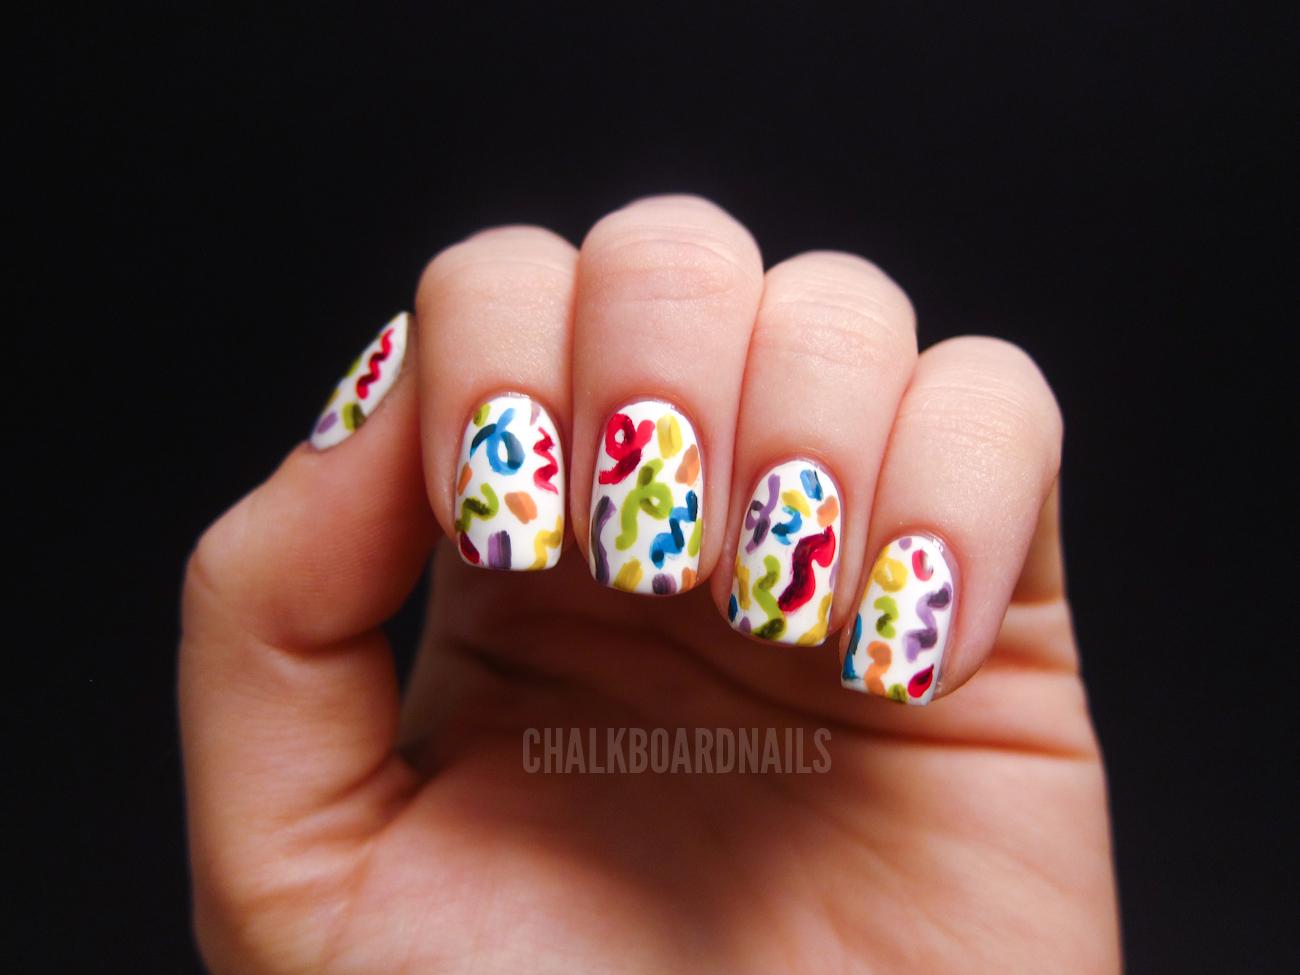 It S My Birthday Chalkboard Nails Nail Art Blog